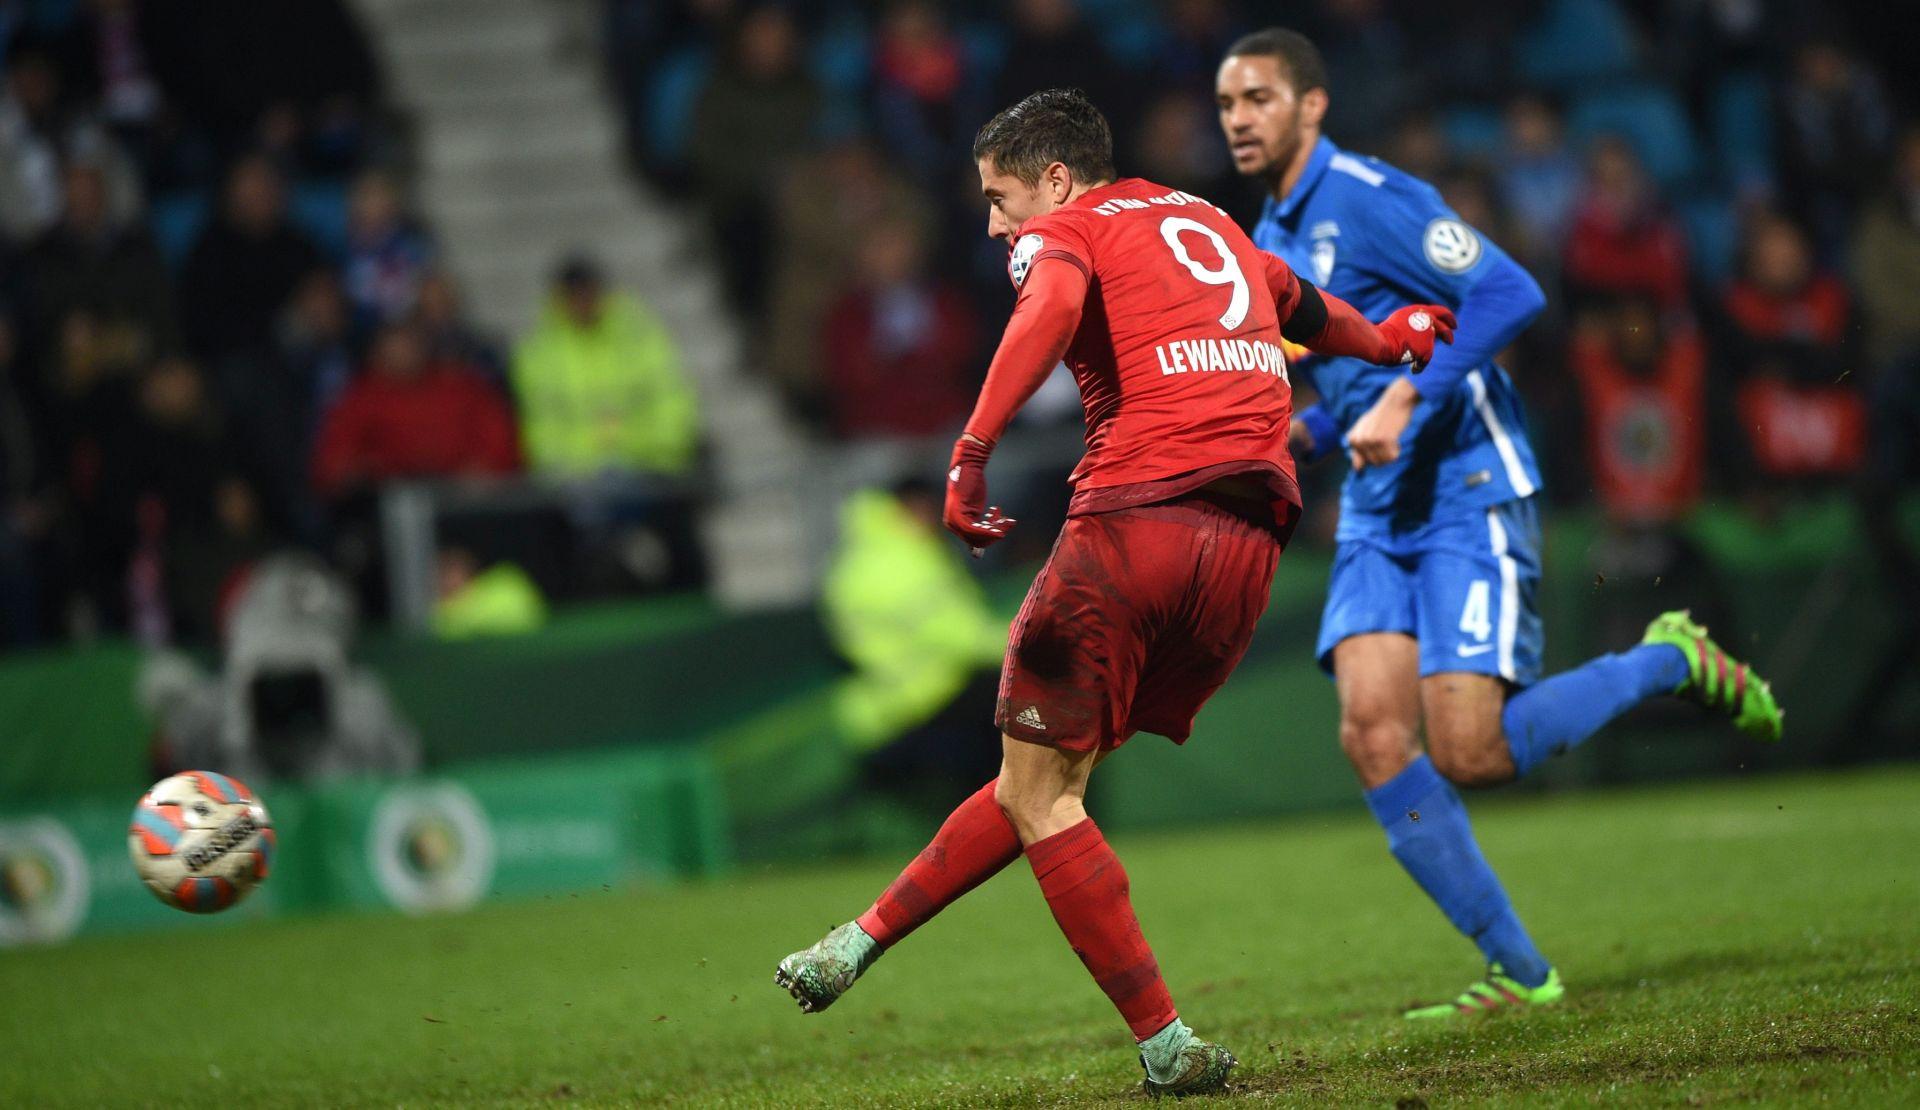 DFB POKAL Hertha i Bayern izborili polufinale njemačkog Kupa